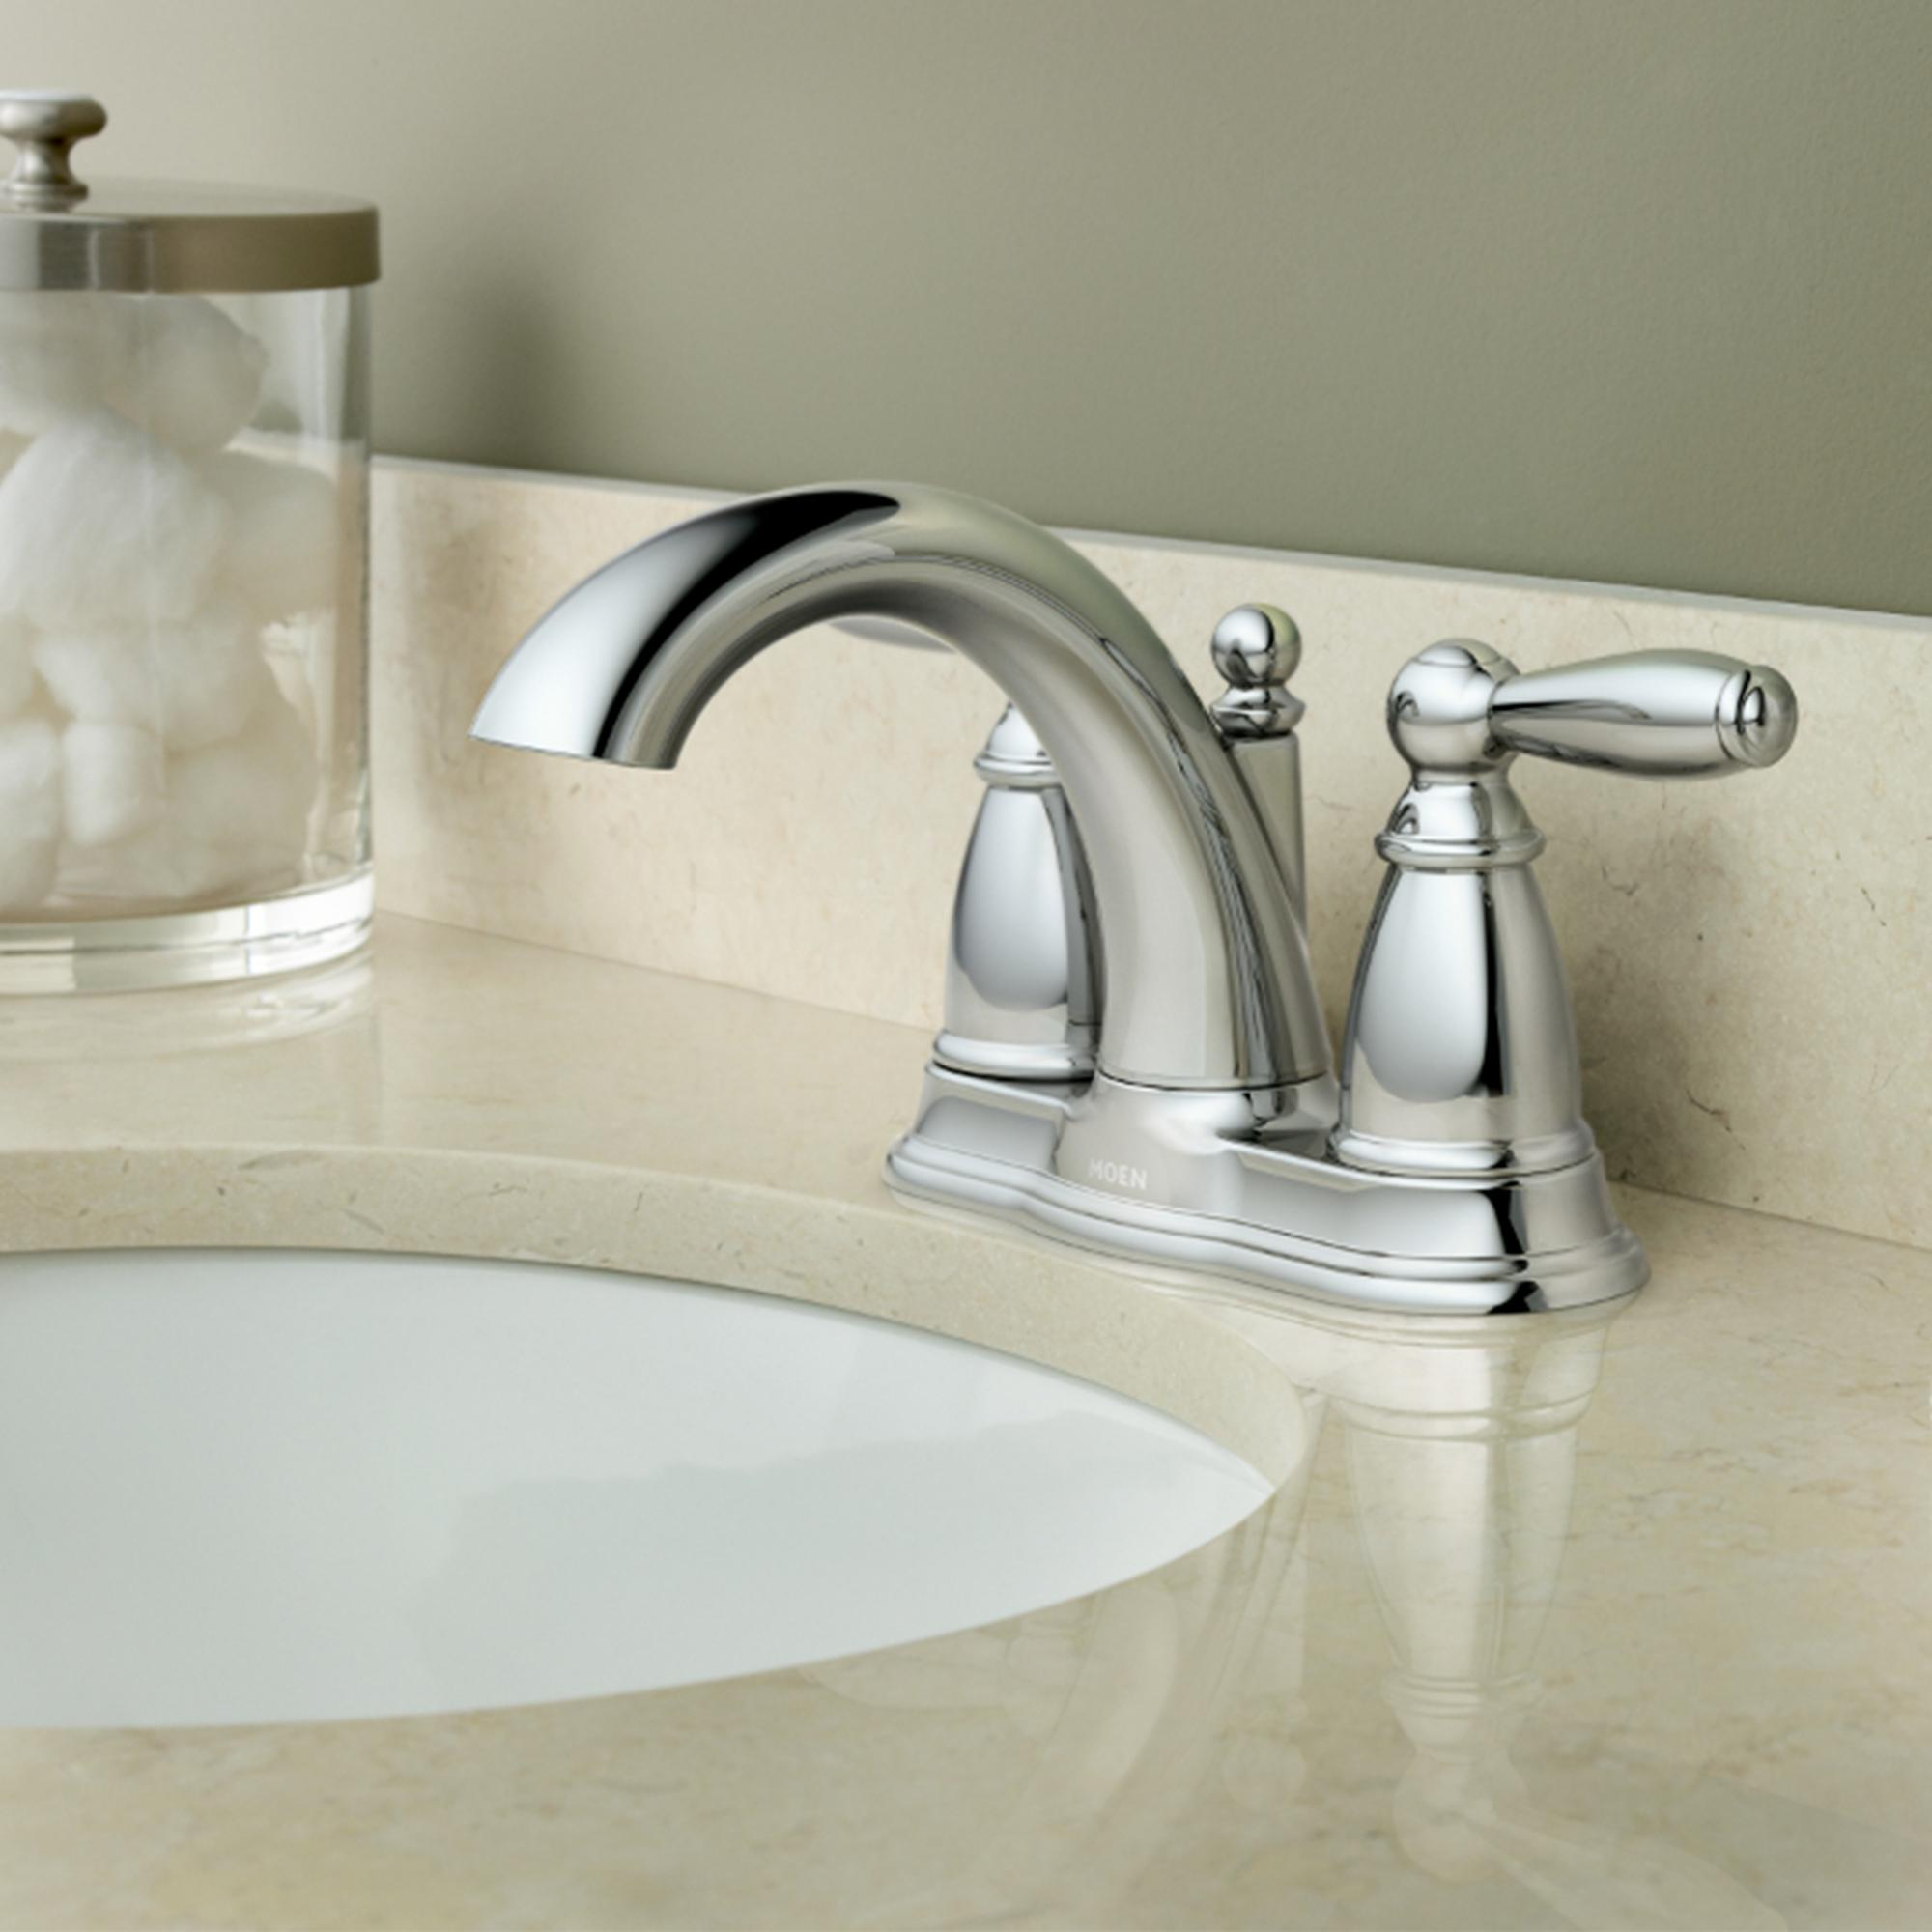 Moen 6610BN Brantford Two-Handle Low Arc Bathroom Faucet with ...